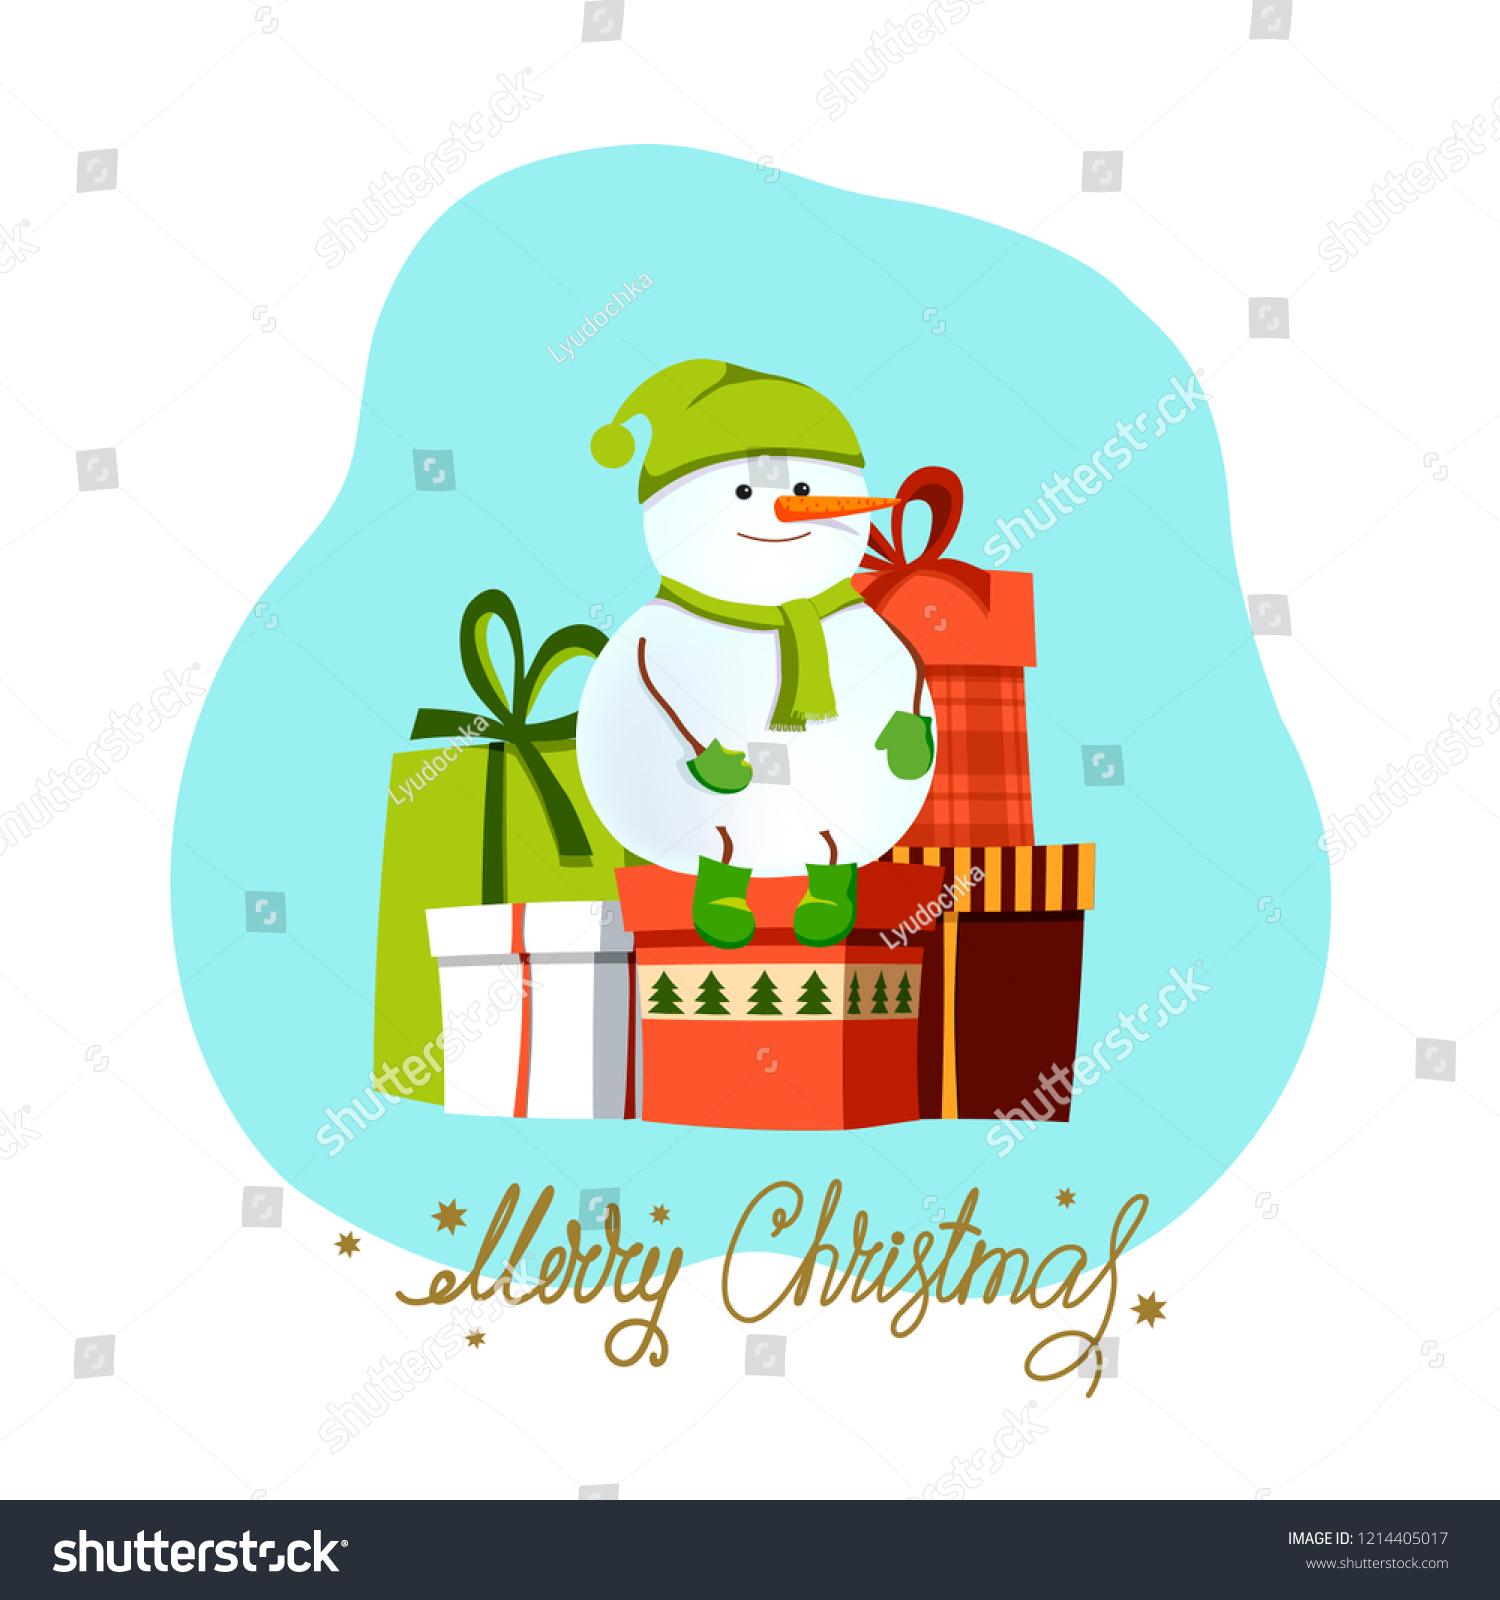 Merry Christmaschristmas Snowman Christmas Presentsvtctor